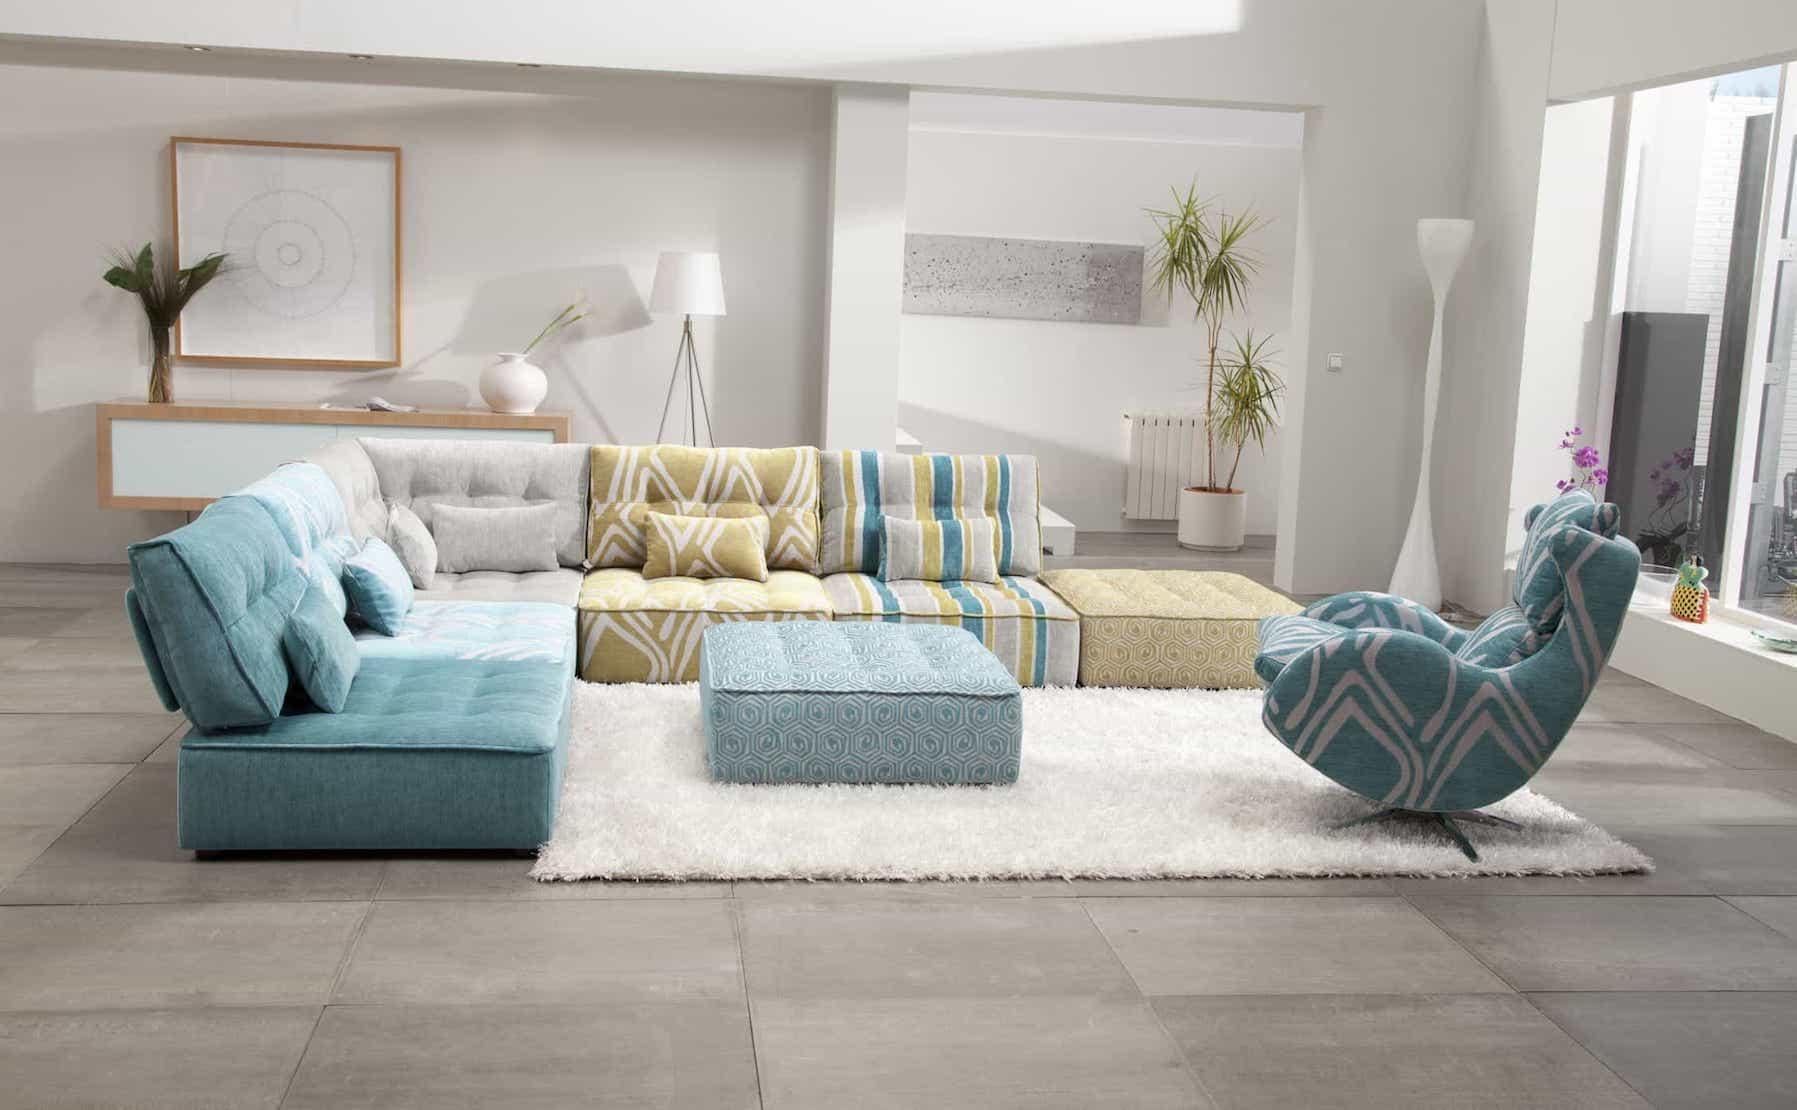 Modern Flokati Rug Decor For Colorful Living Room (View 5 of 10)